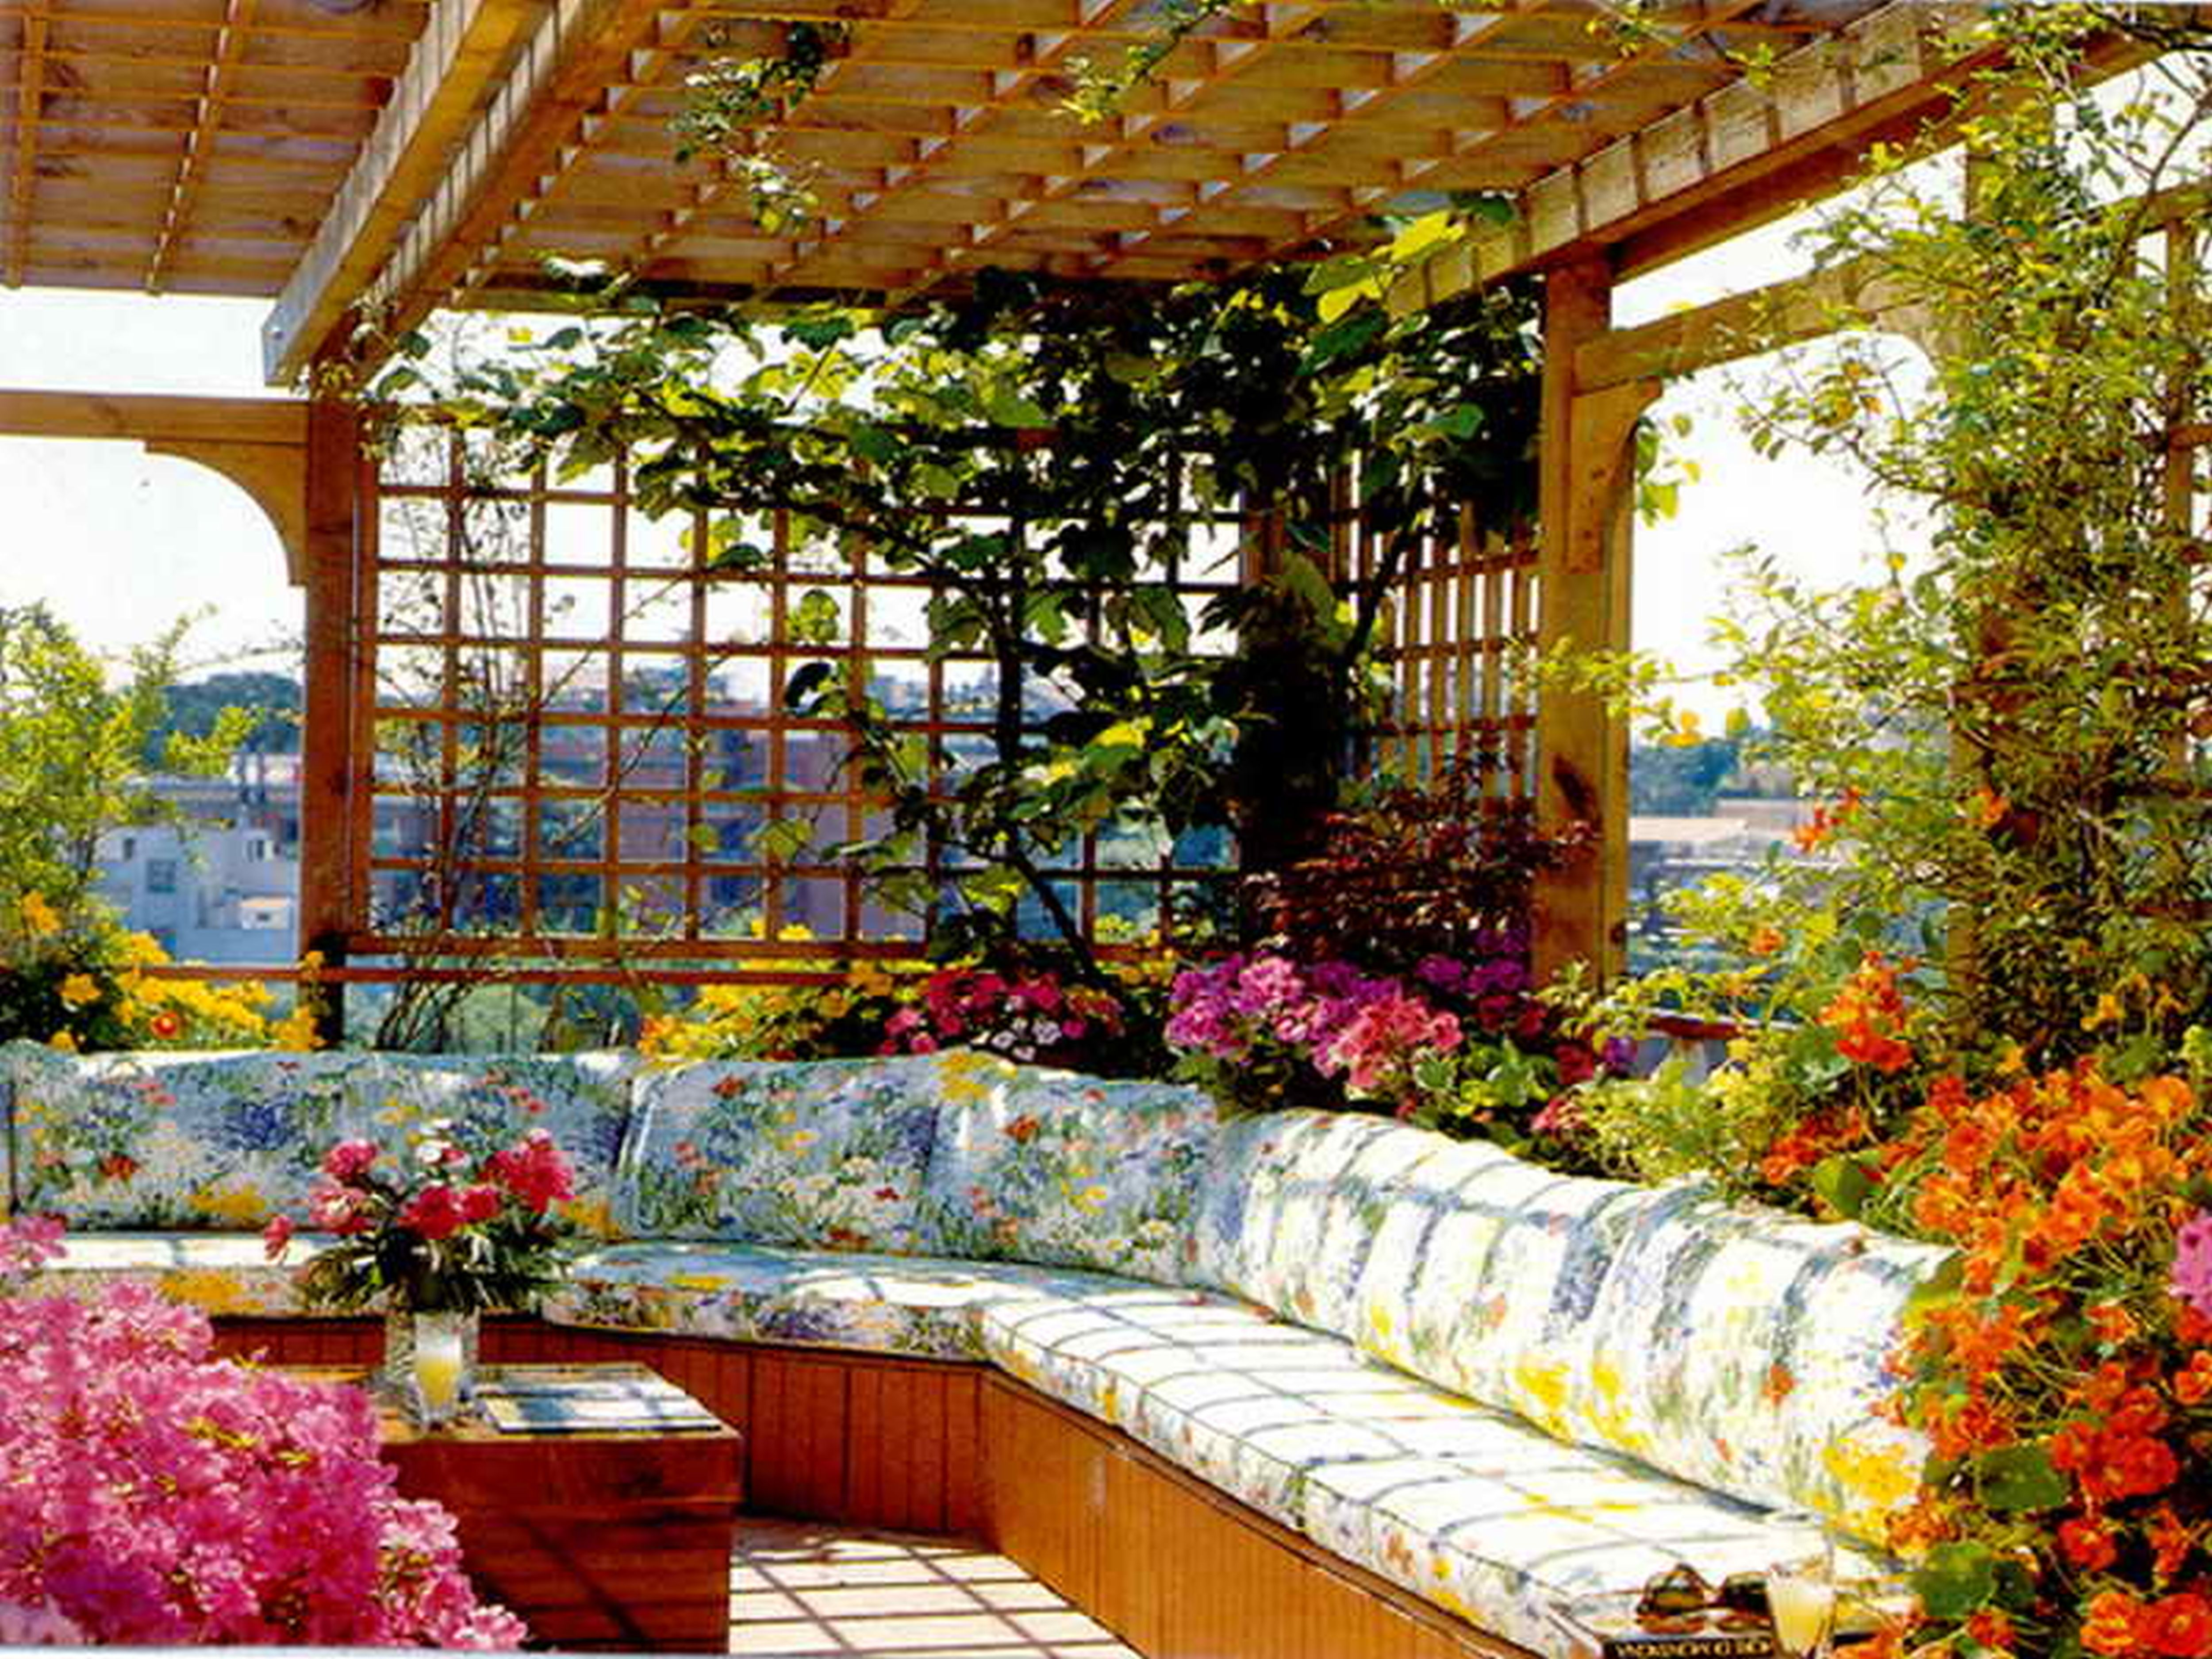 Flower Garden Designs flower garden designs and layouts Rooftop Flower Garden Design Ideas Mediterranean Style 1836